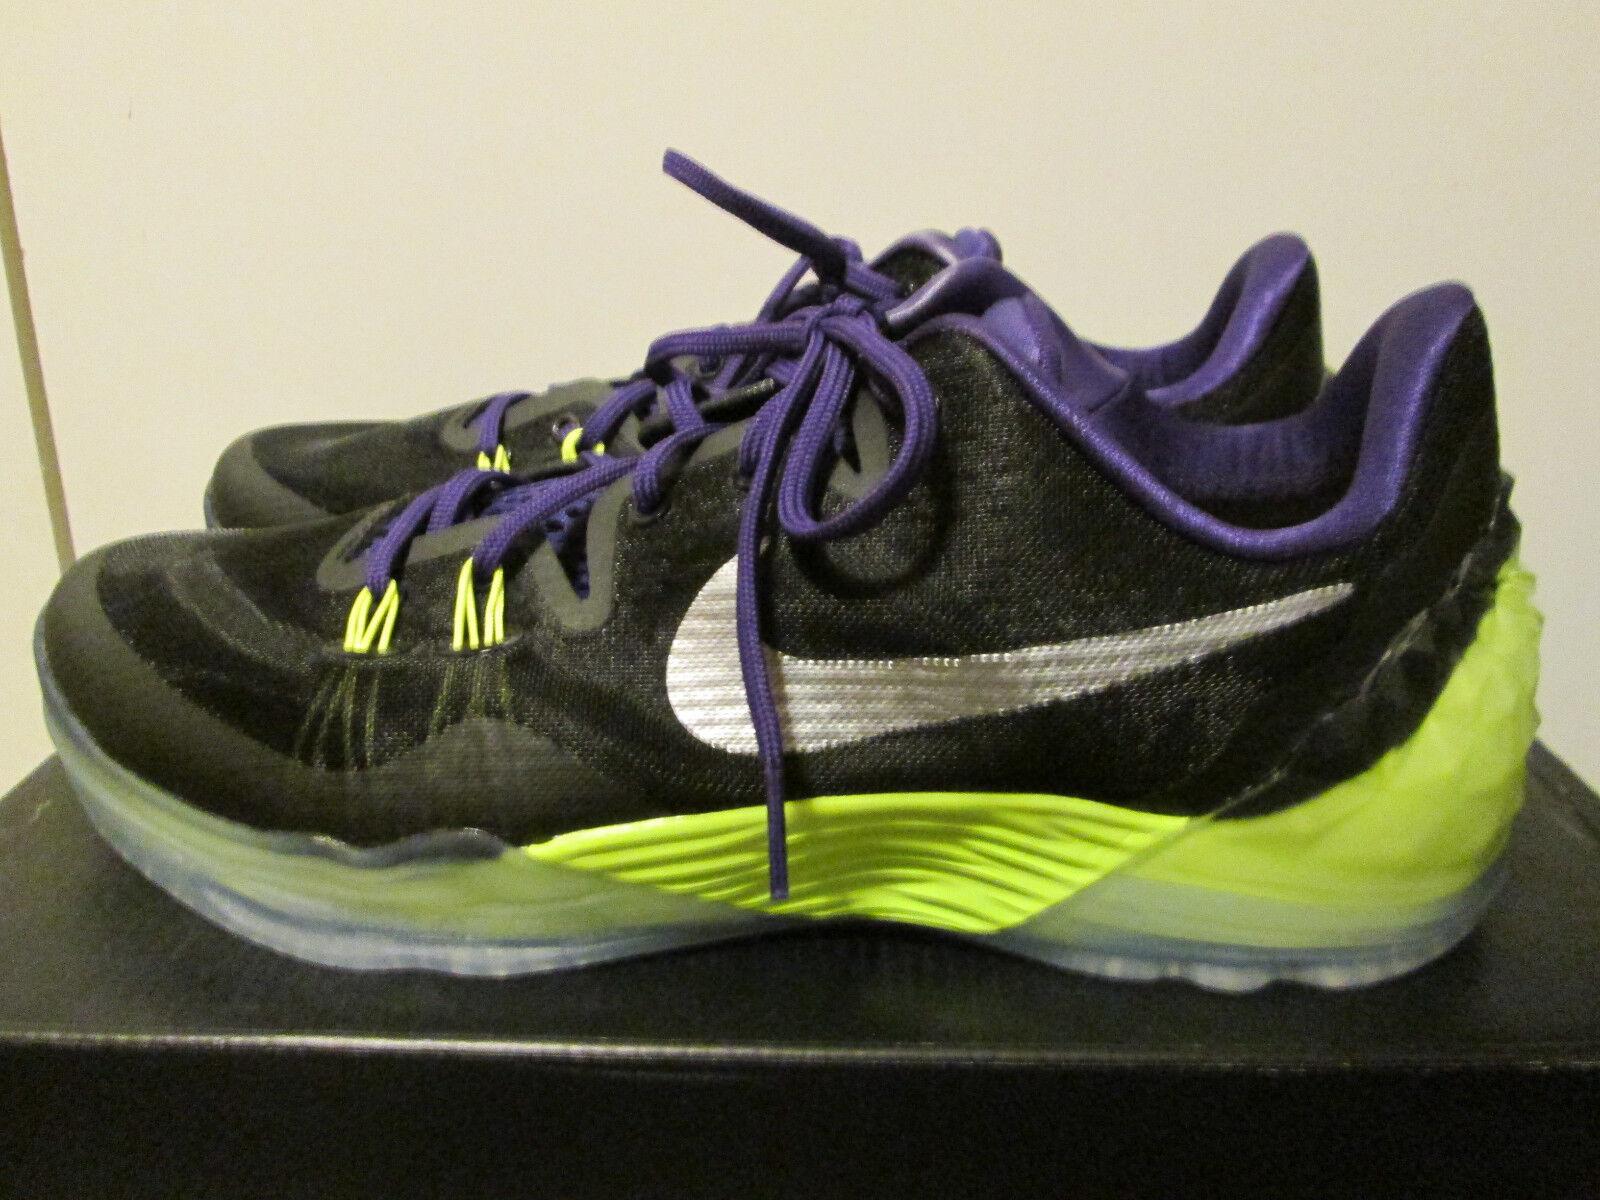 Nike Kobe Venomenon 5 Black Purple Volt Basketball Shoes Sz 10.5 749884-005 NEW